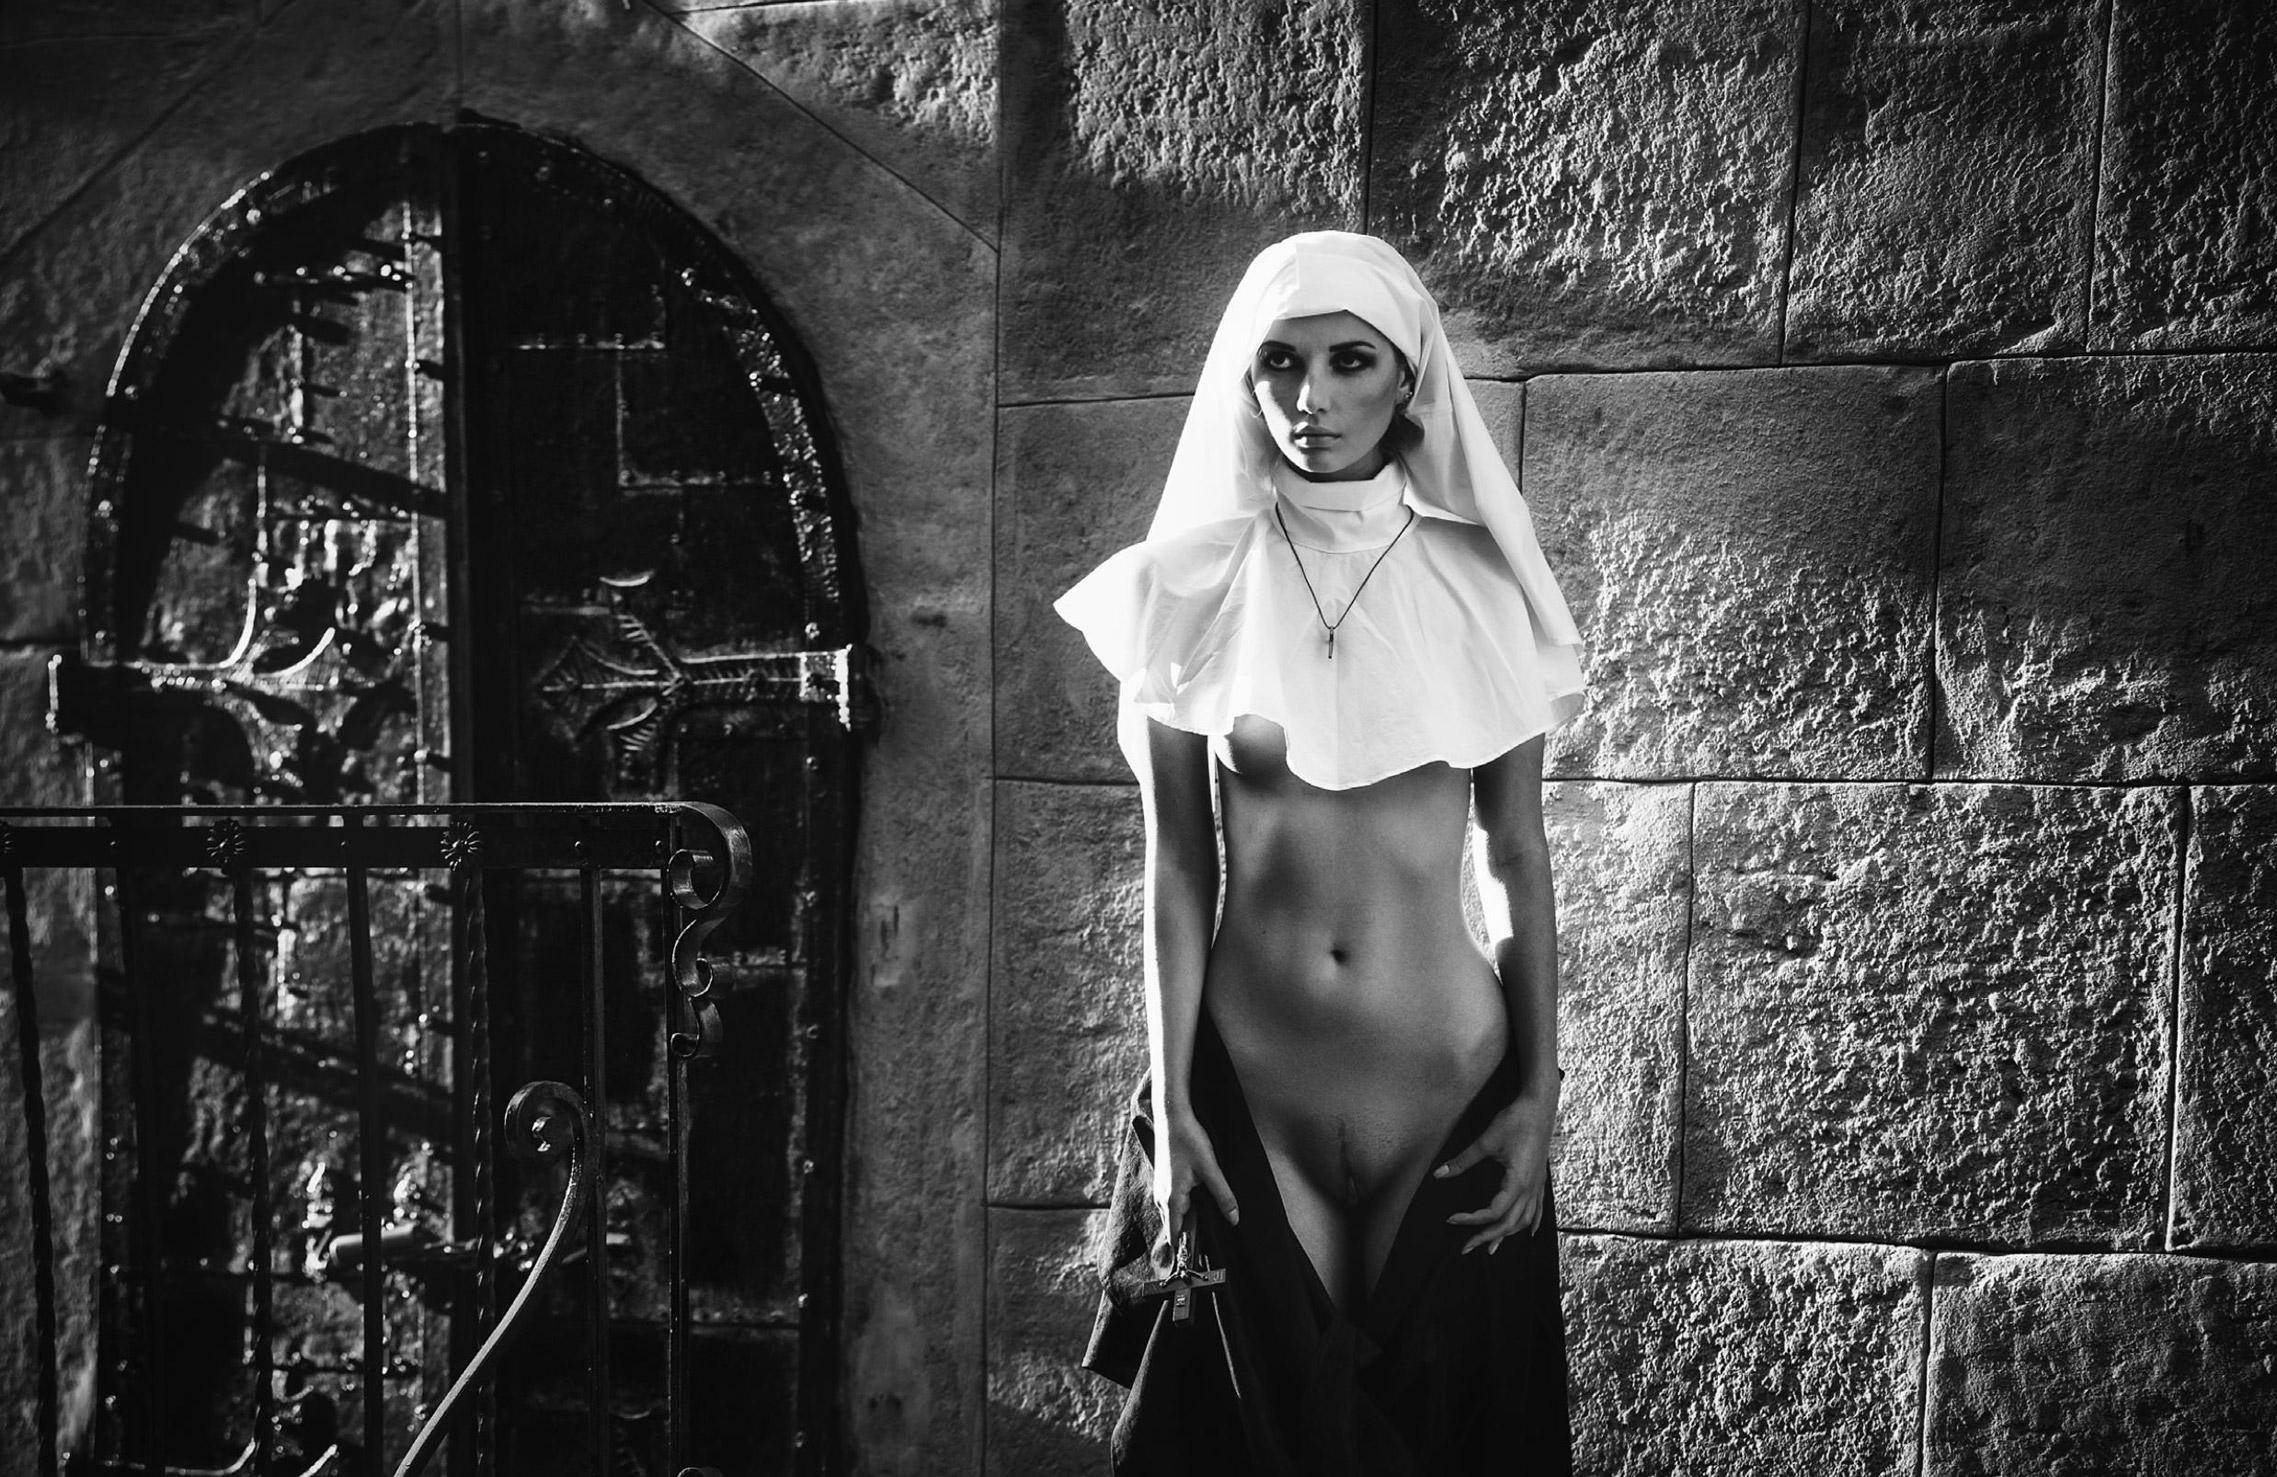 Голышом по улицам Львова - Марина Нельсон (Marina Nelson) на фотографиях Аркадия Курта / Sin City